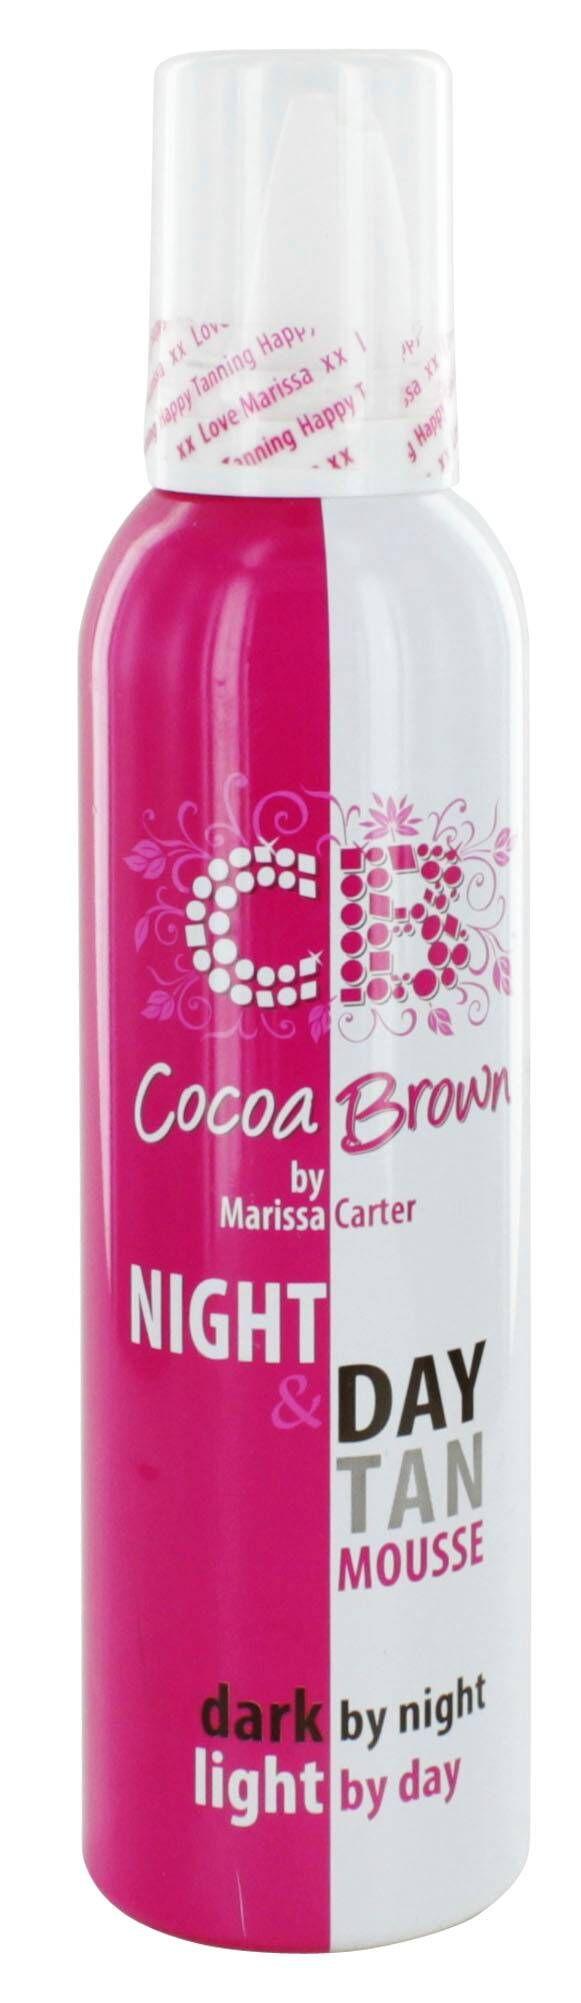 Cocoa Brown Night And Day Tan 150 ml